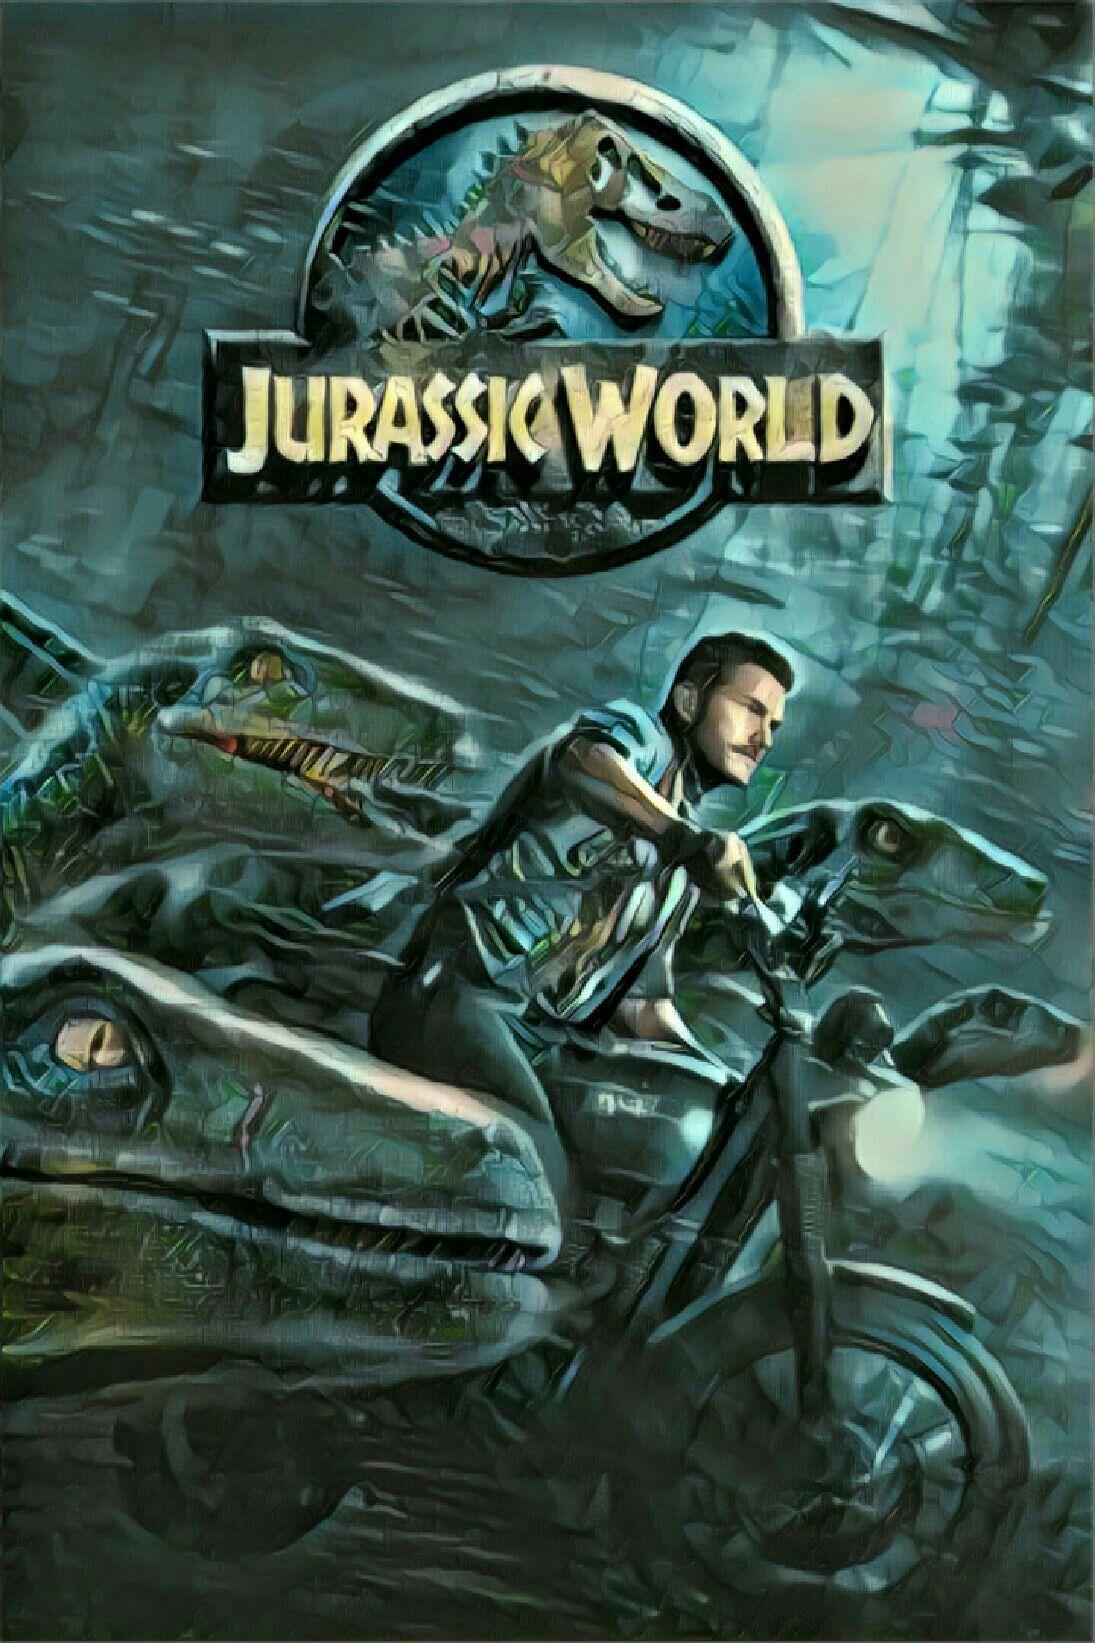 Jurassic World Movie Poster Cartoon Versions Of Movie Posters